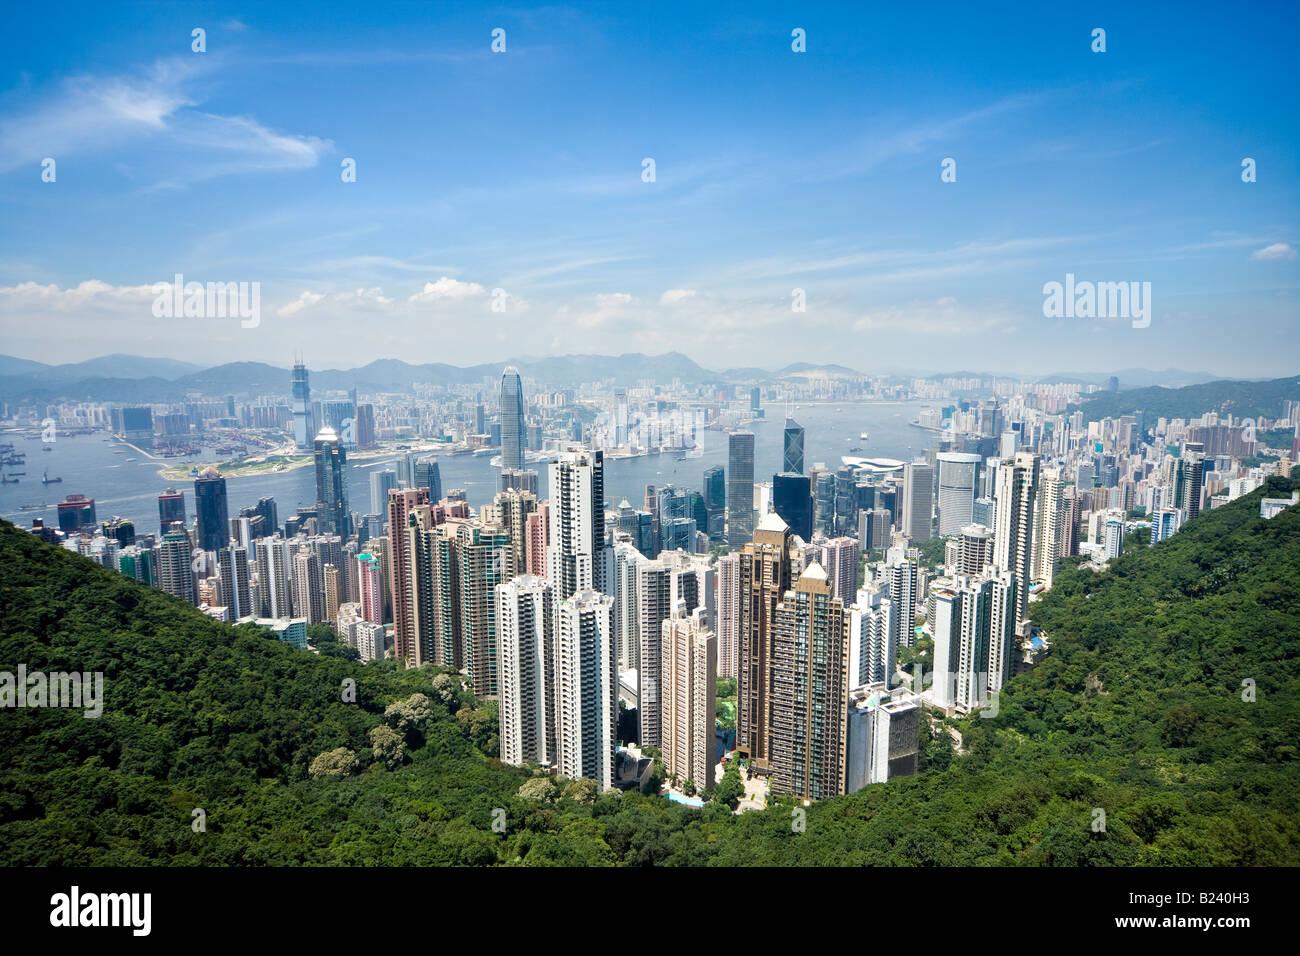 Skyline di Hong Kong. Vista panoramica di Hong Kong e Kowloon da Victoria Peak Tower. Hong Kong, Cina, SAR, su una Immagini Stock